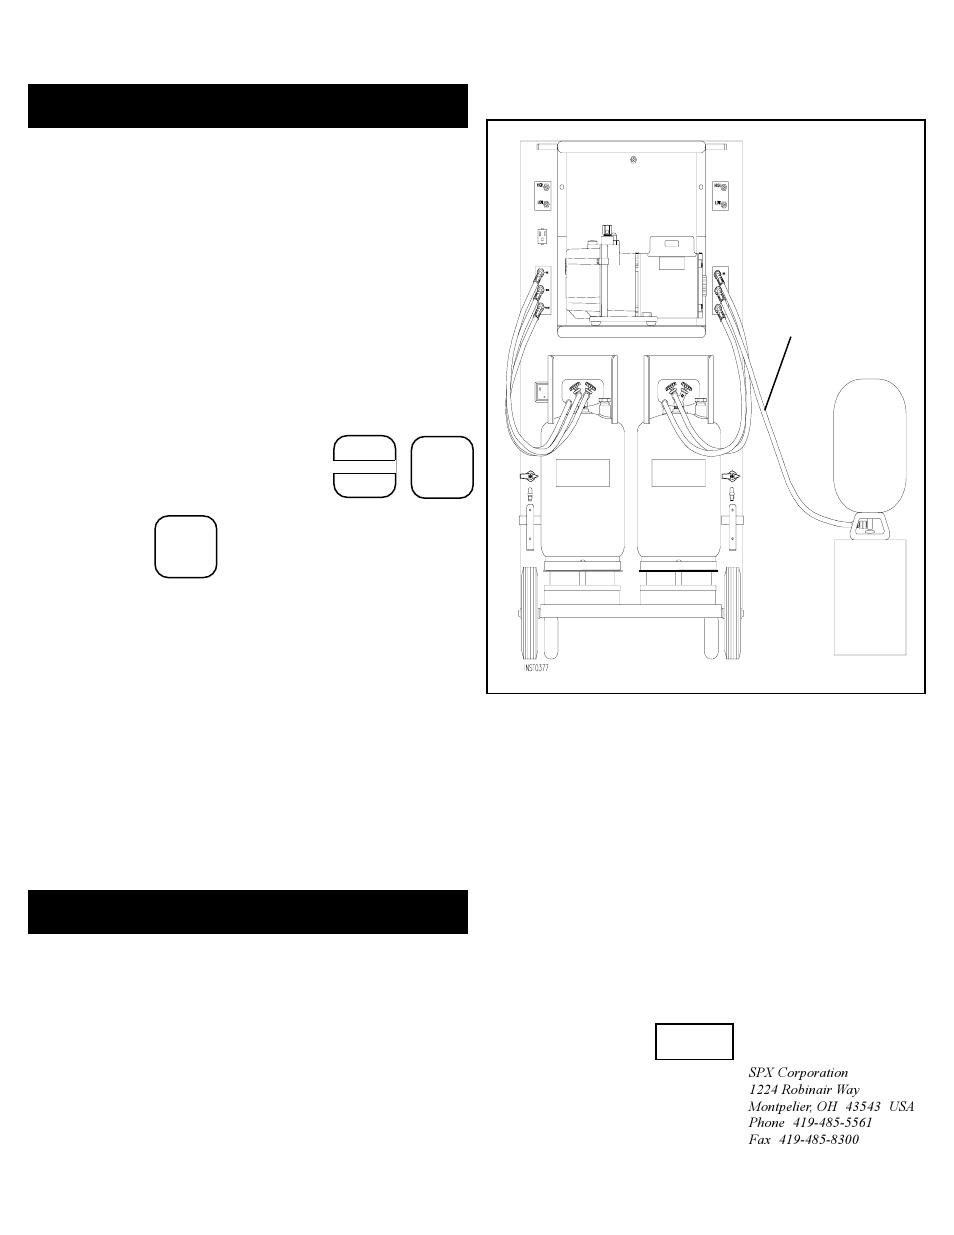 recycle manual changing refrigerant types spx robinair rh manualsdir com Robinair Parts Robinair Parts